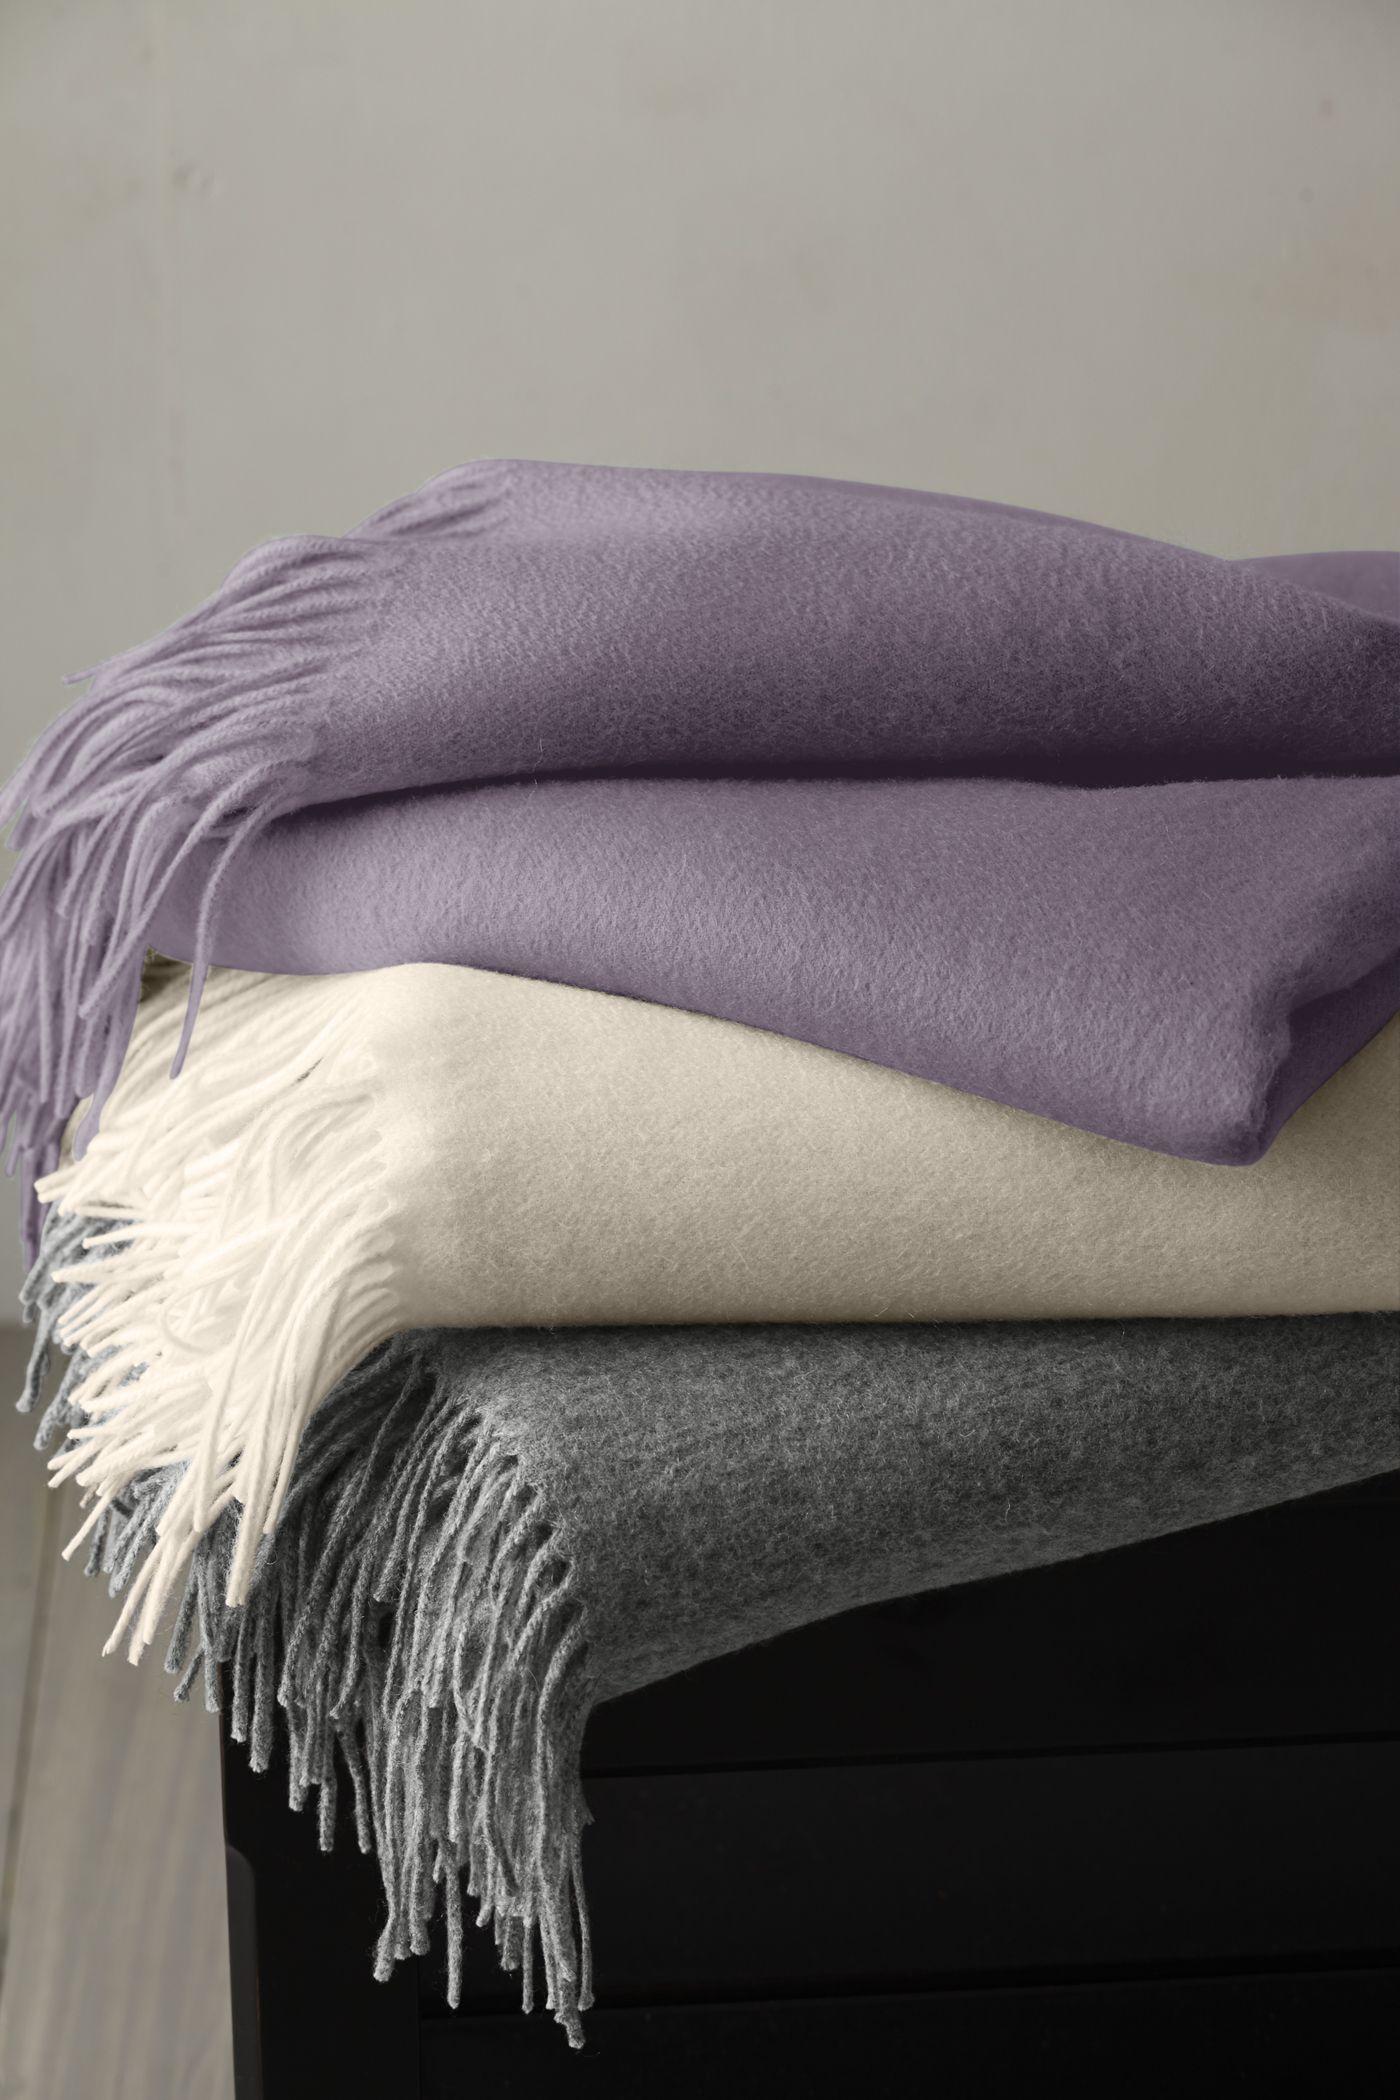 The 25 Best Cashmere Throw Ideas On Pinterest Cashmere Throw Blanket Cashmere And Cozy Blankets